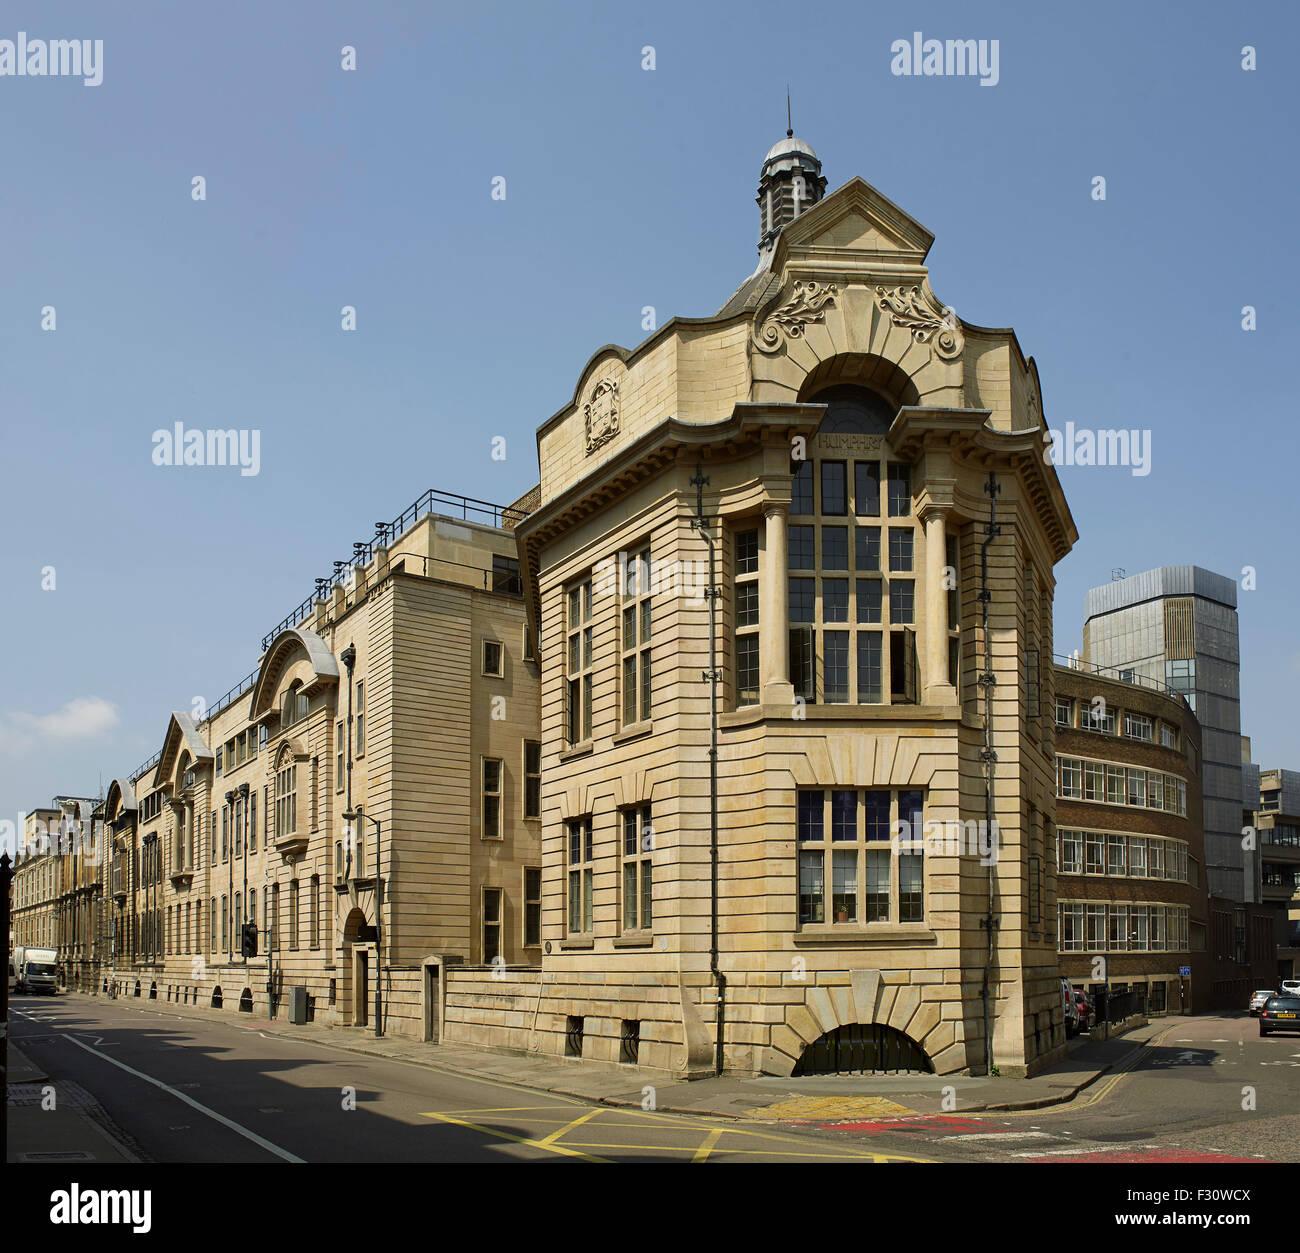 Cambridge University, Zoology Department - Stock Image